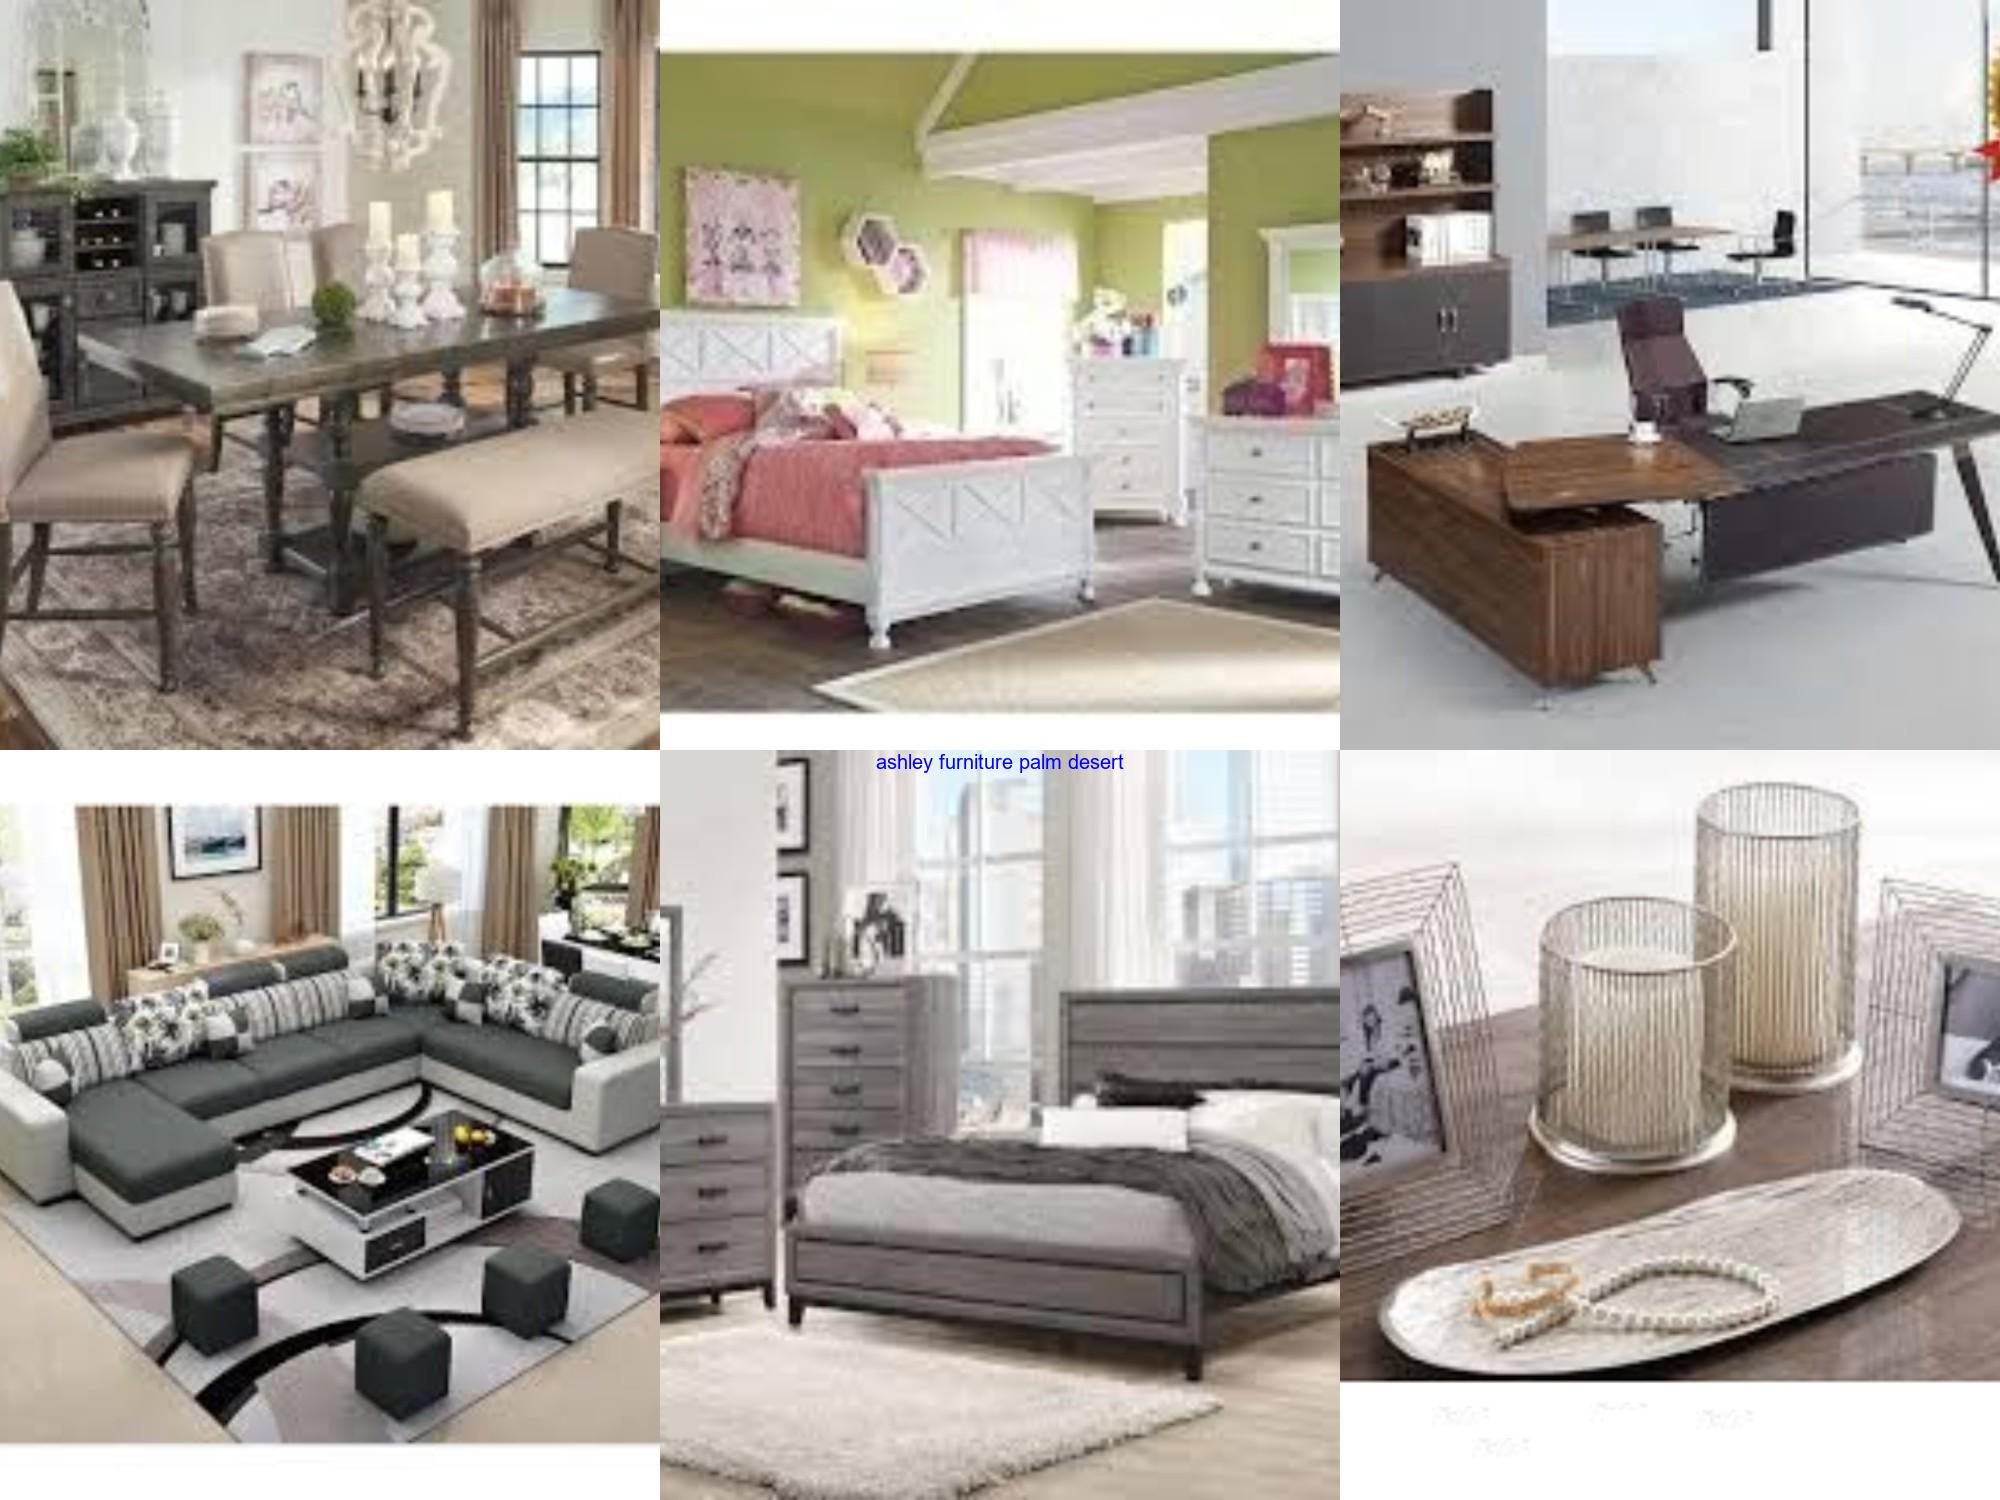 Ashley Furniture Palm Desert In 2020 Furniture Prices Bedroom Set Furniture Reviews